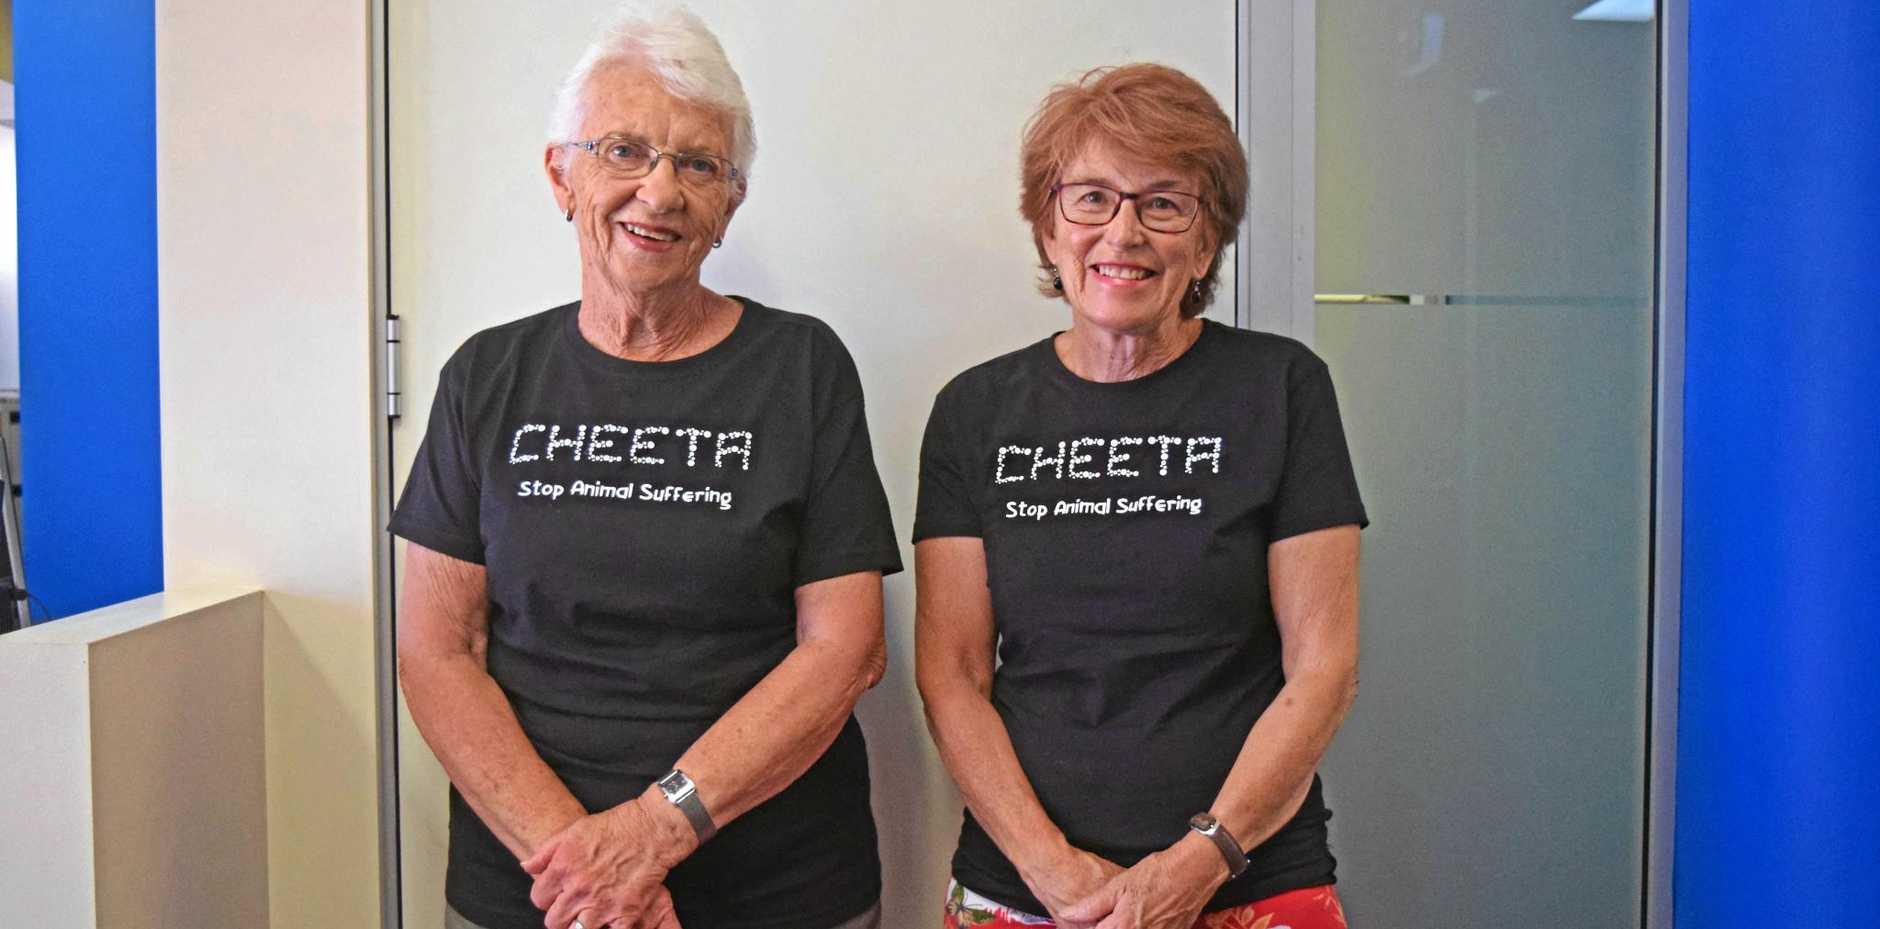 Community champion Kathy Jones from CHEETA with Maureen McKeown.